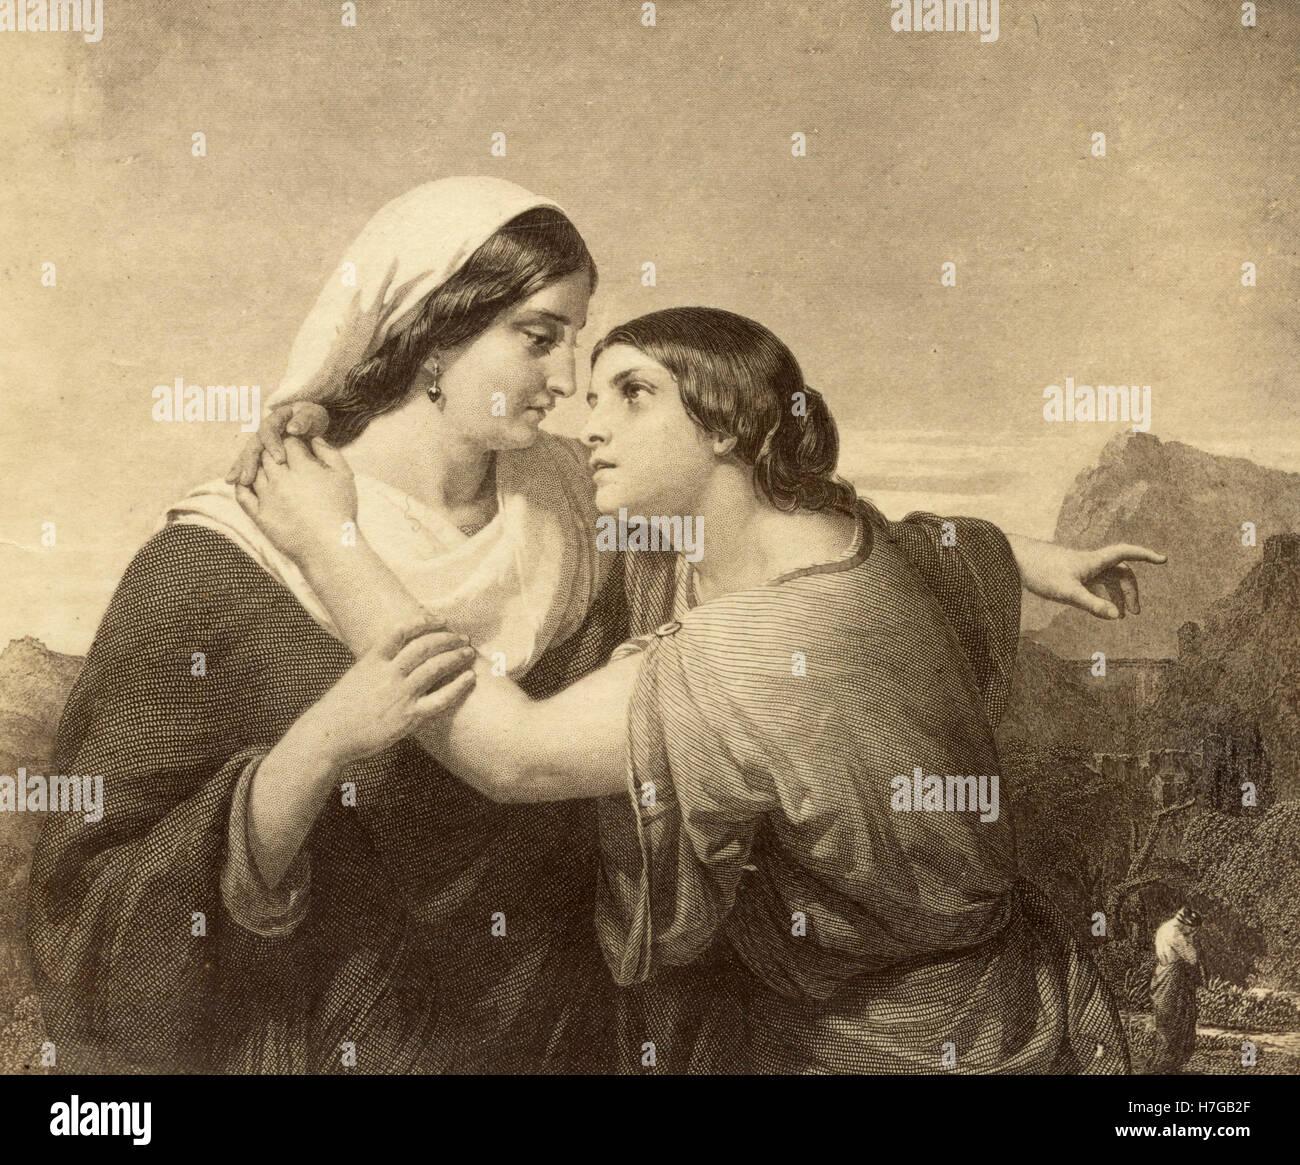 Ruth and Naomi, print - Stock Image